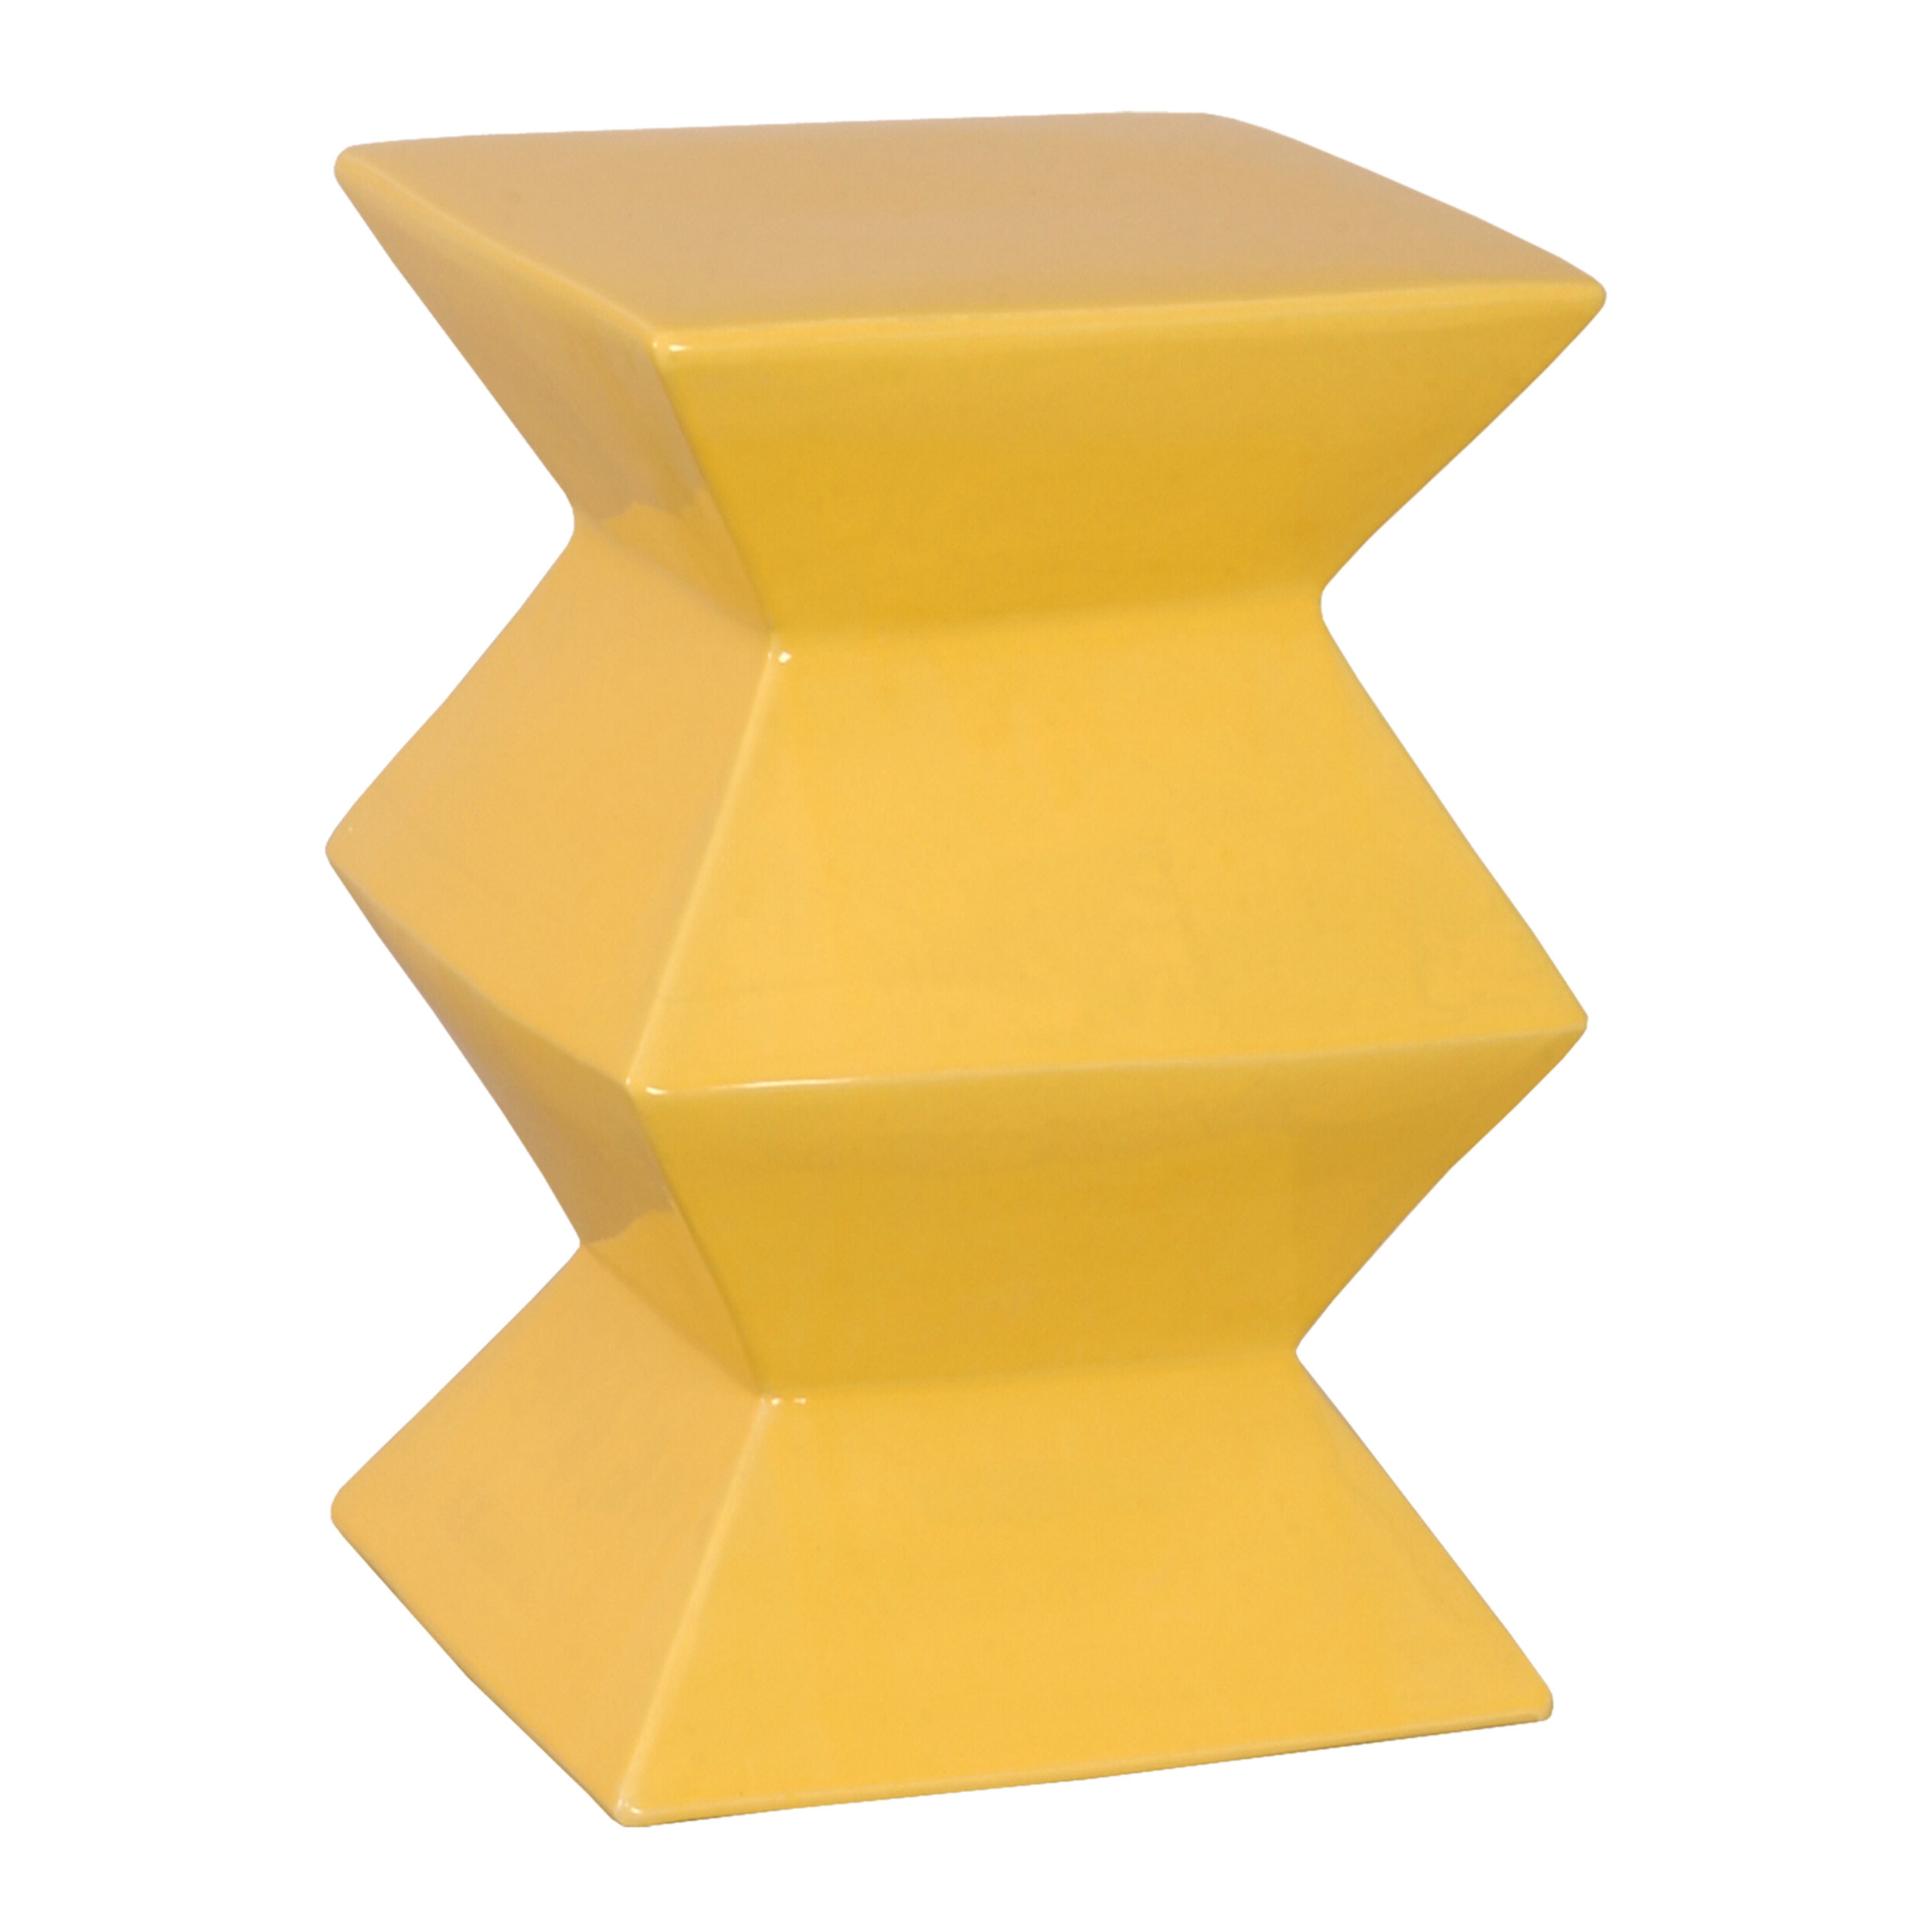 Jadiel Garden Stool Intended For Most Current Jadiel Ceramic Garden Stools (View 5 of 30)